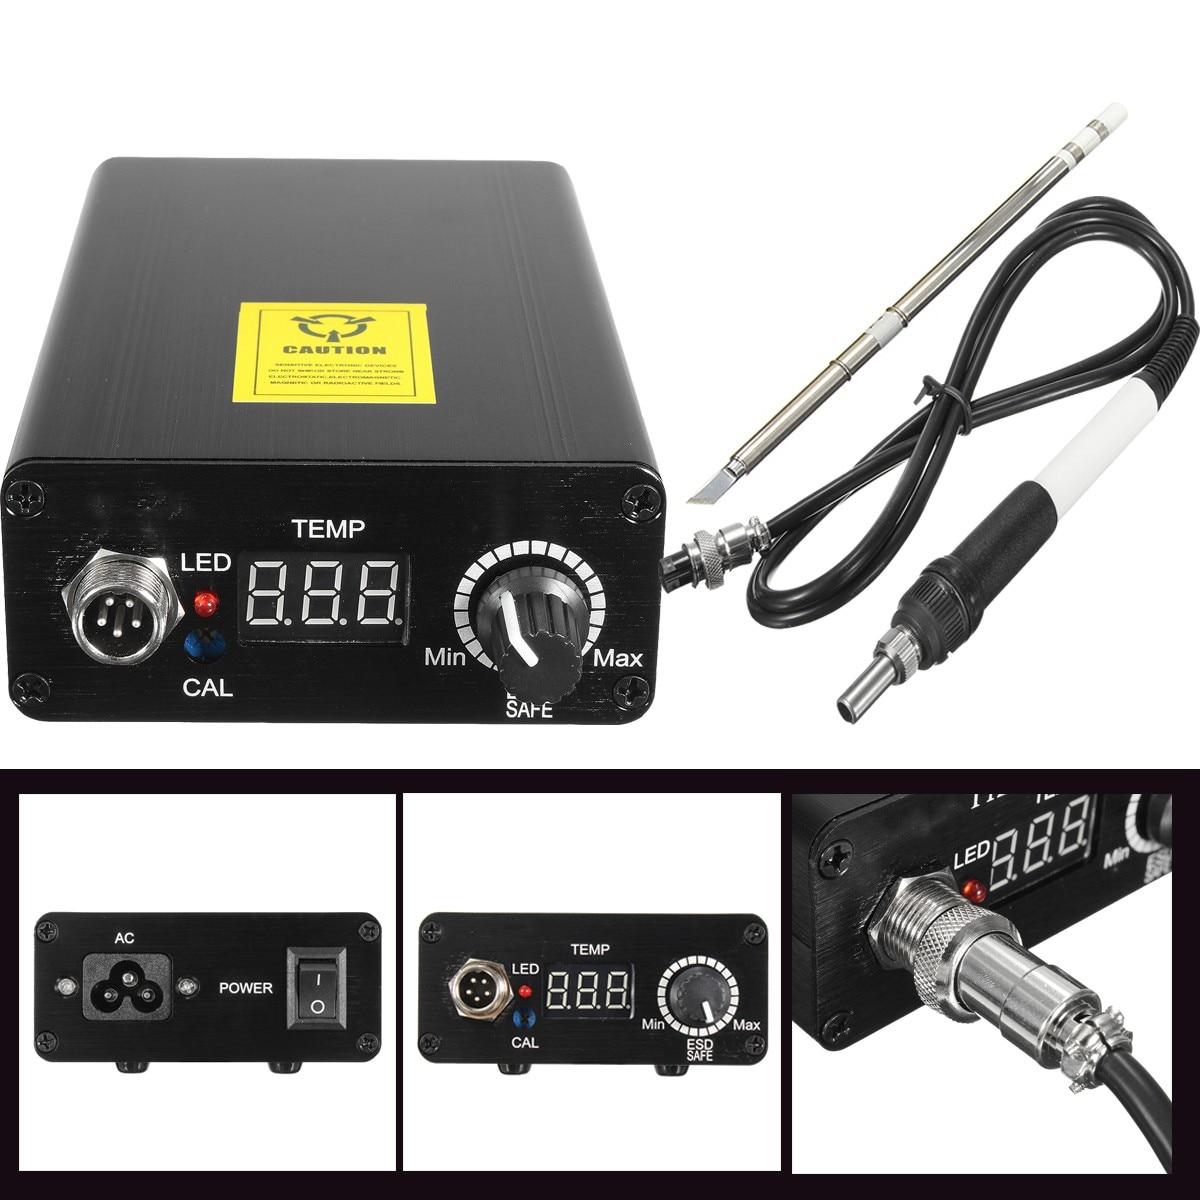 T12 Soldering Station Electronic Welding Iron for HAKKO T12 Handle+T12-K Tips LED Digital Soldering Iron kit